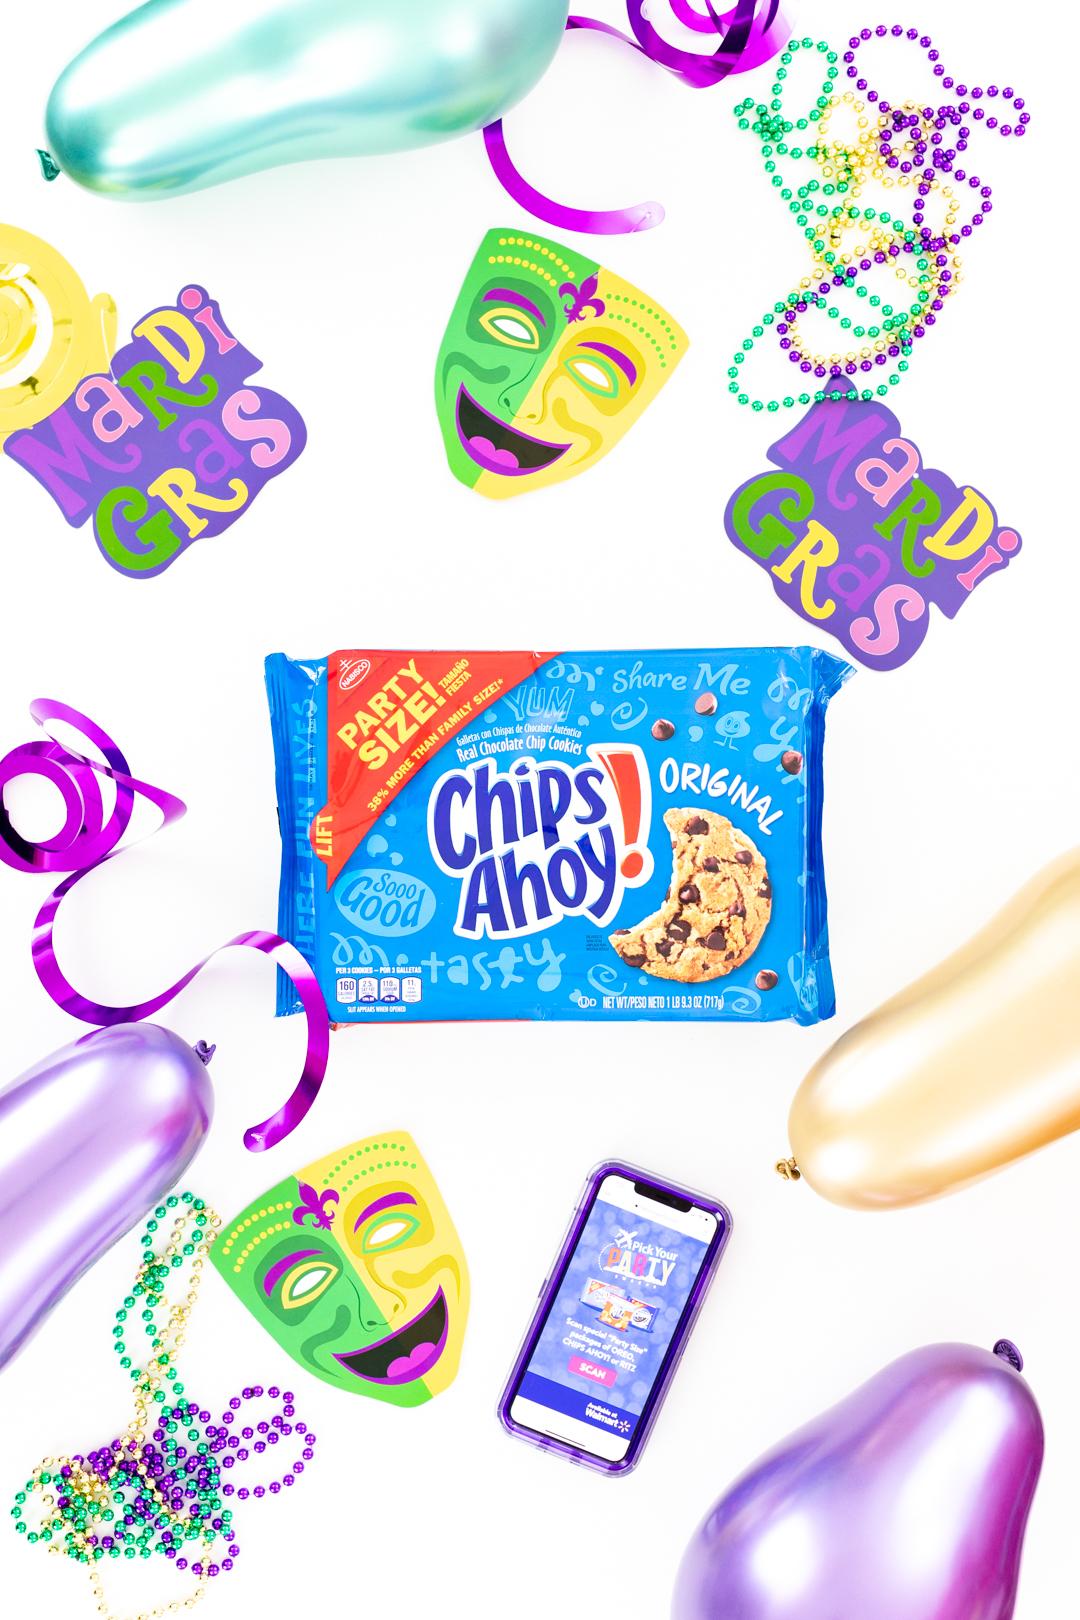 Metallic Mardi Gras Balloons and party supplies